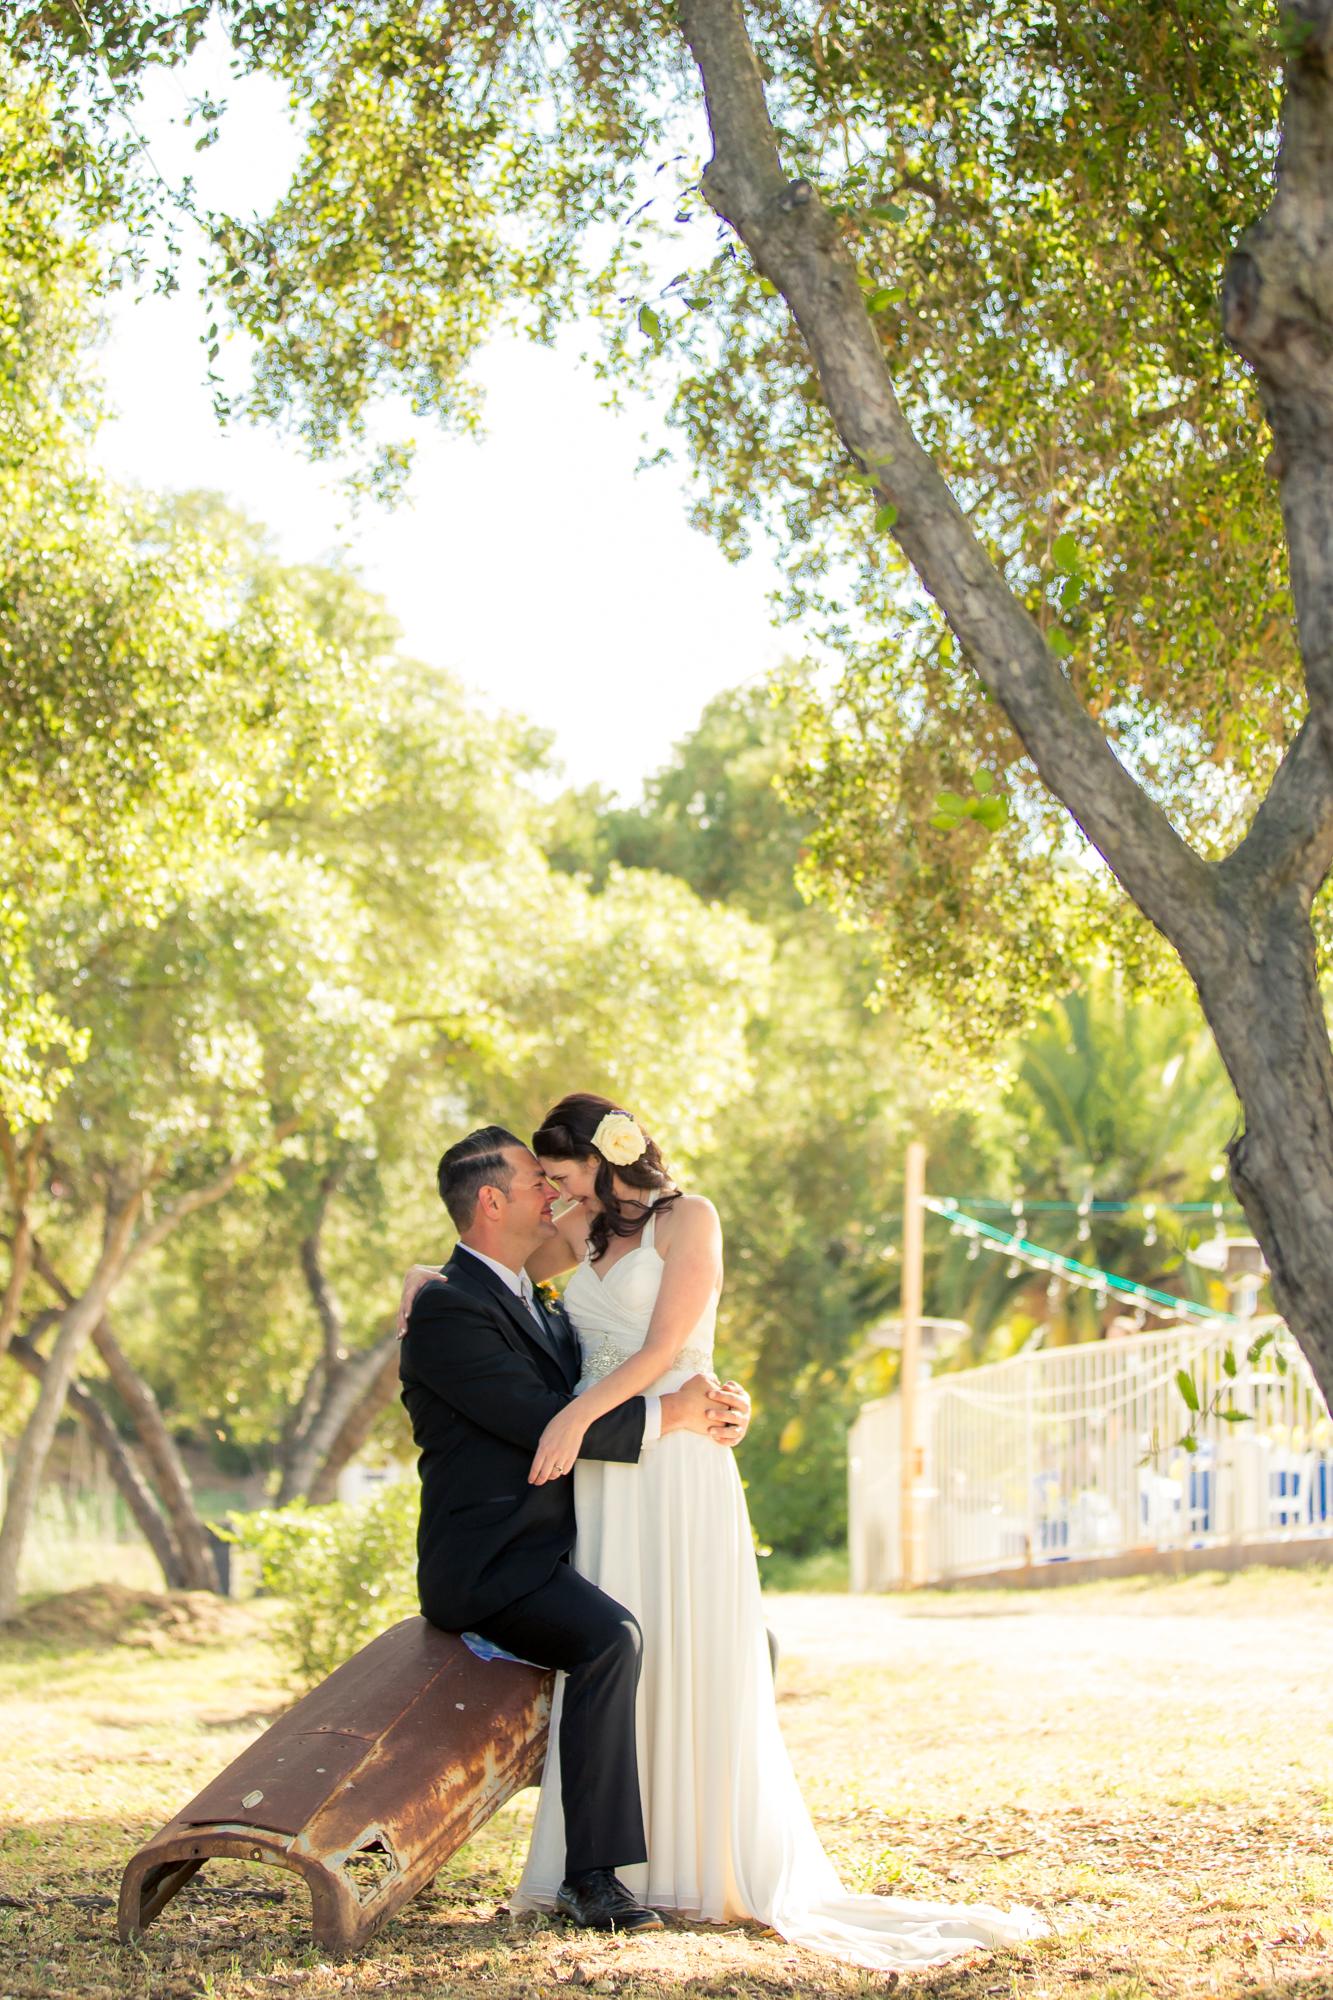 Gary-Kasl-SandKasl-Imaging-Wedding-Photography-36.jpg